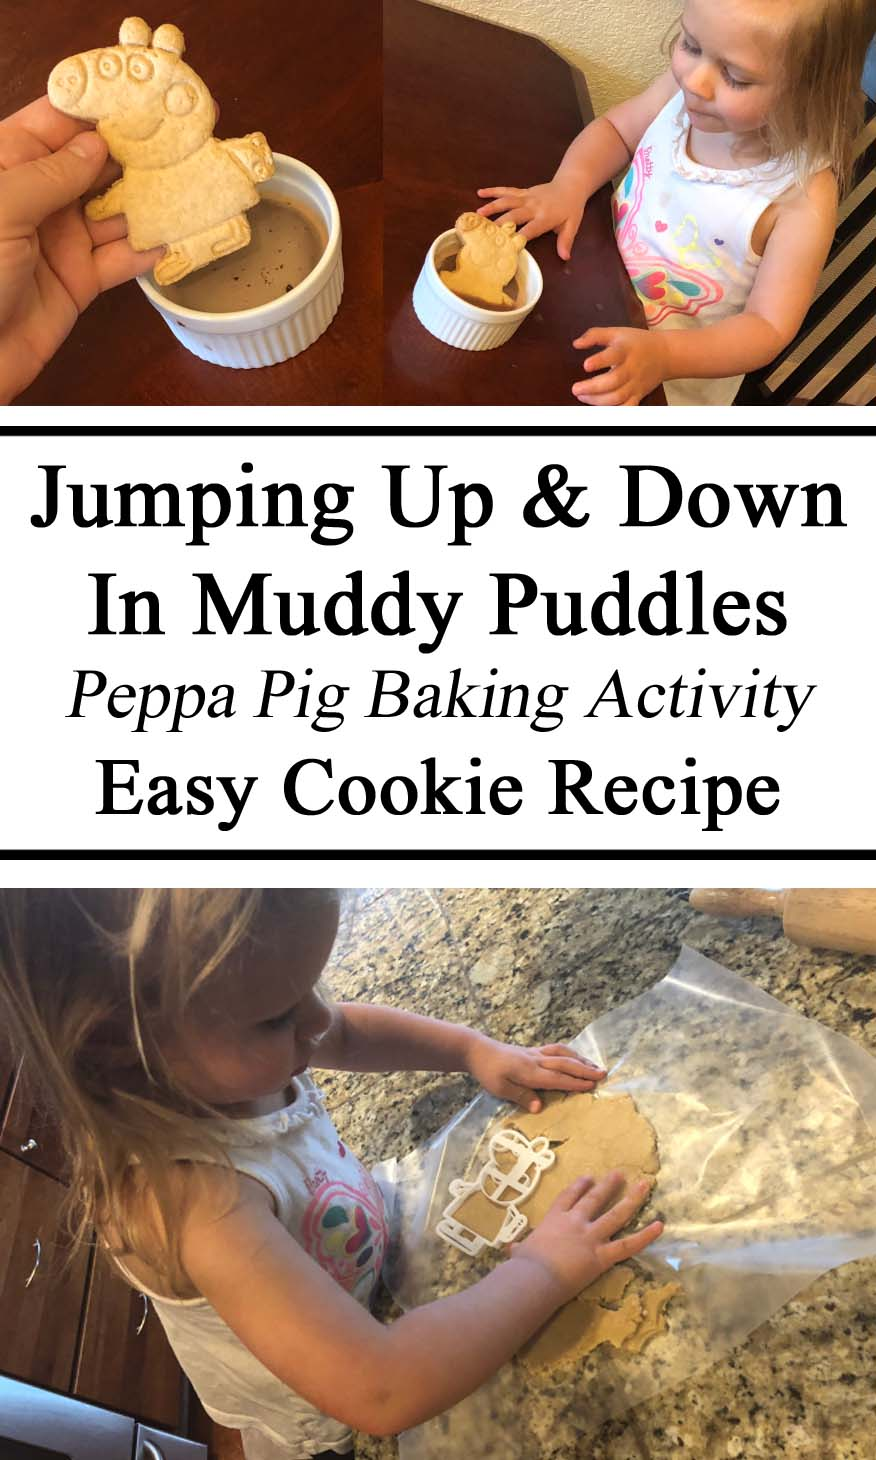 Peppa Pig, Cookie Recipe, Activity, Hands on, Themed Activity, Practical Life Skills, Toddlers, Preschool, Tot School, DIY, Parent Resources, Inspiration